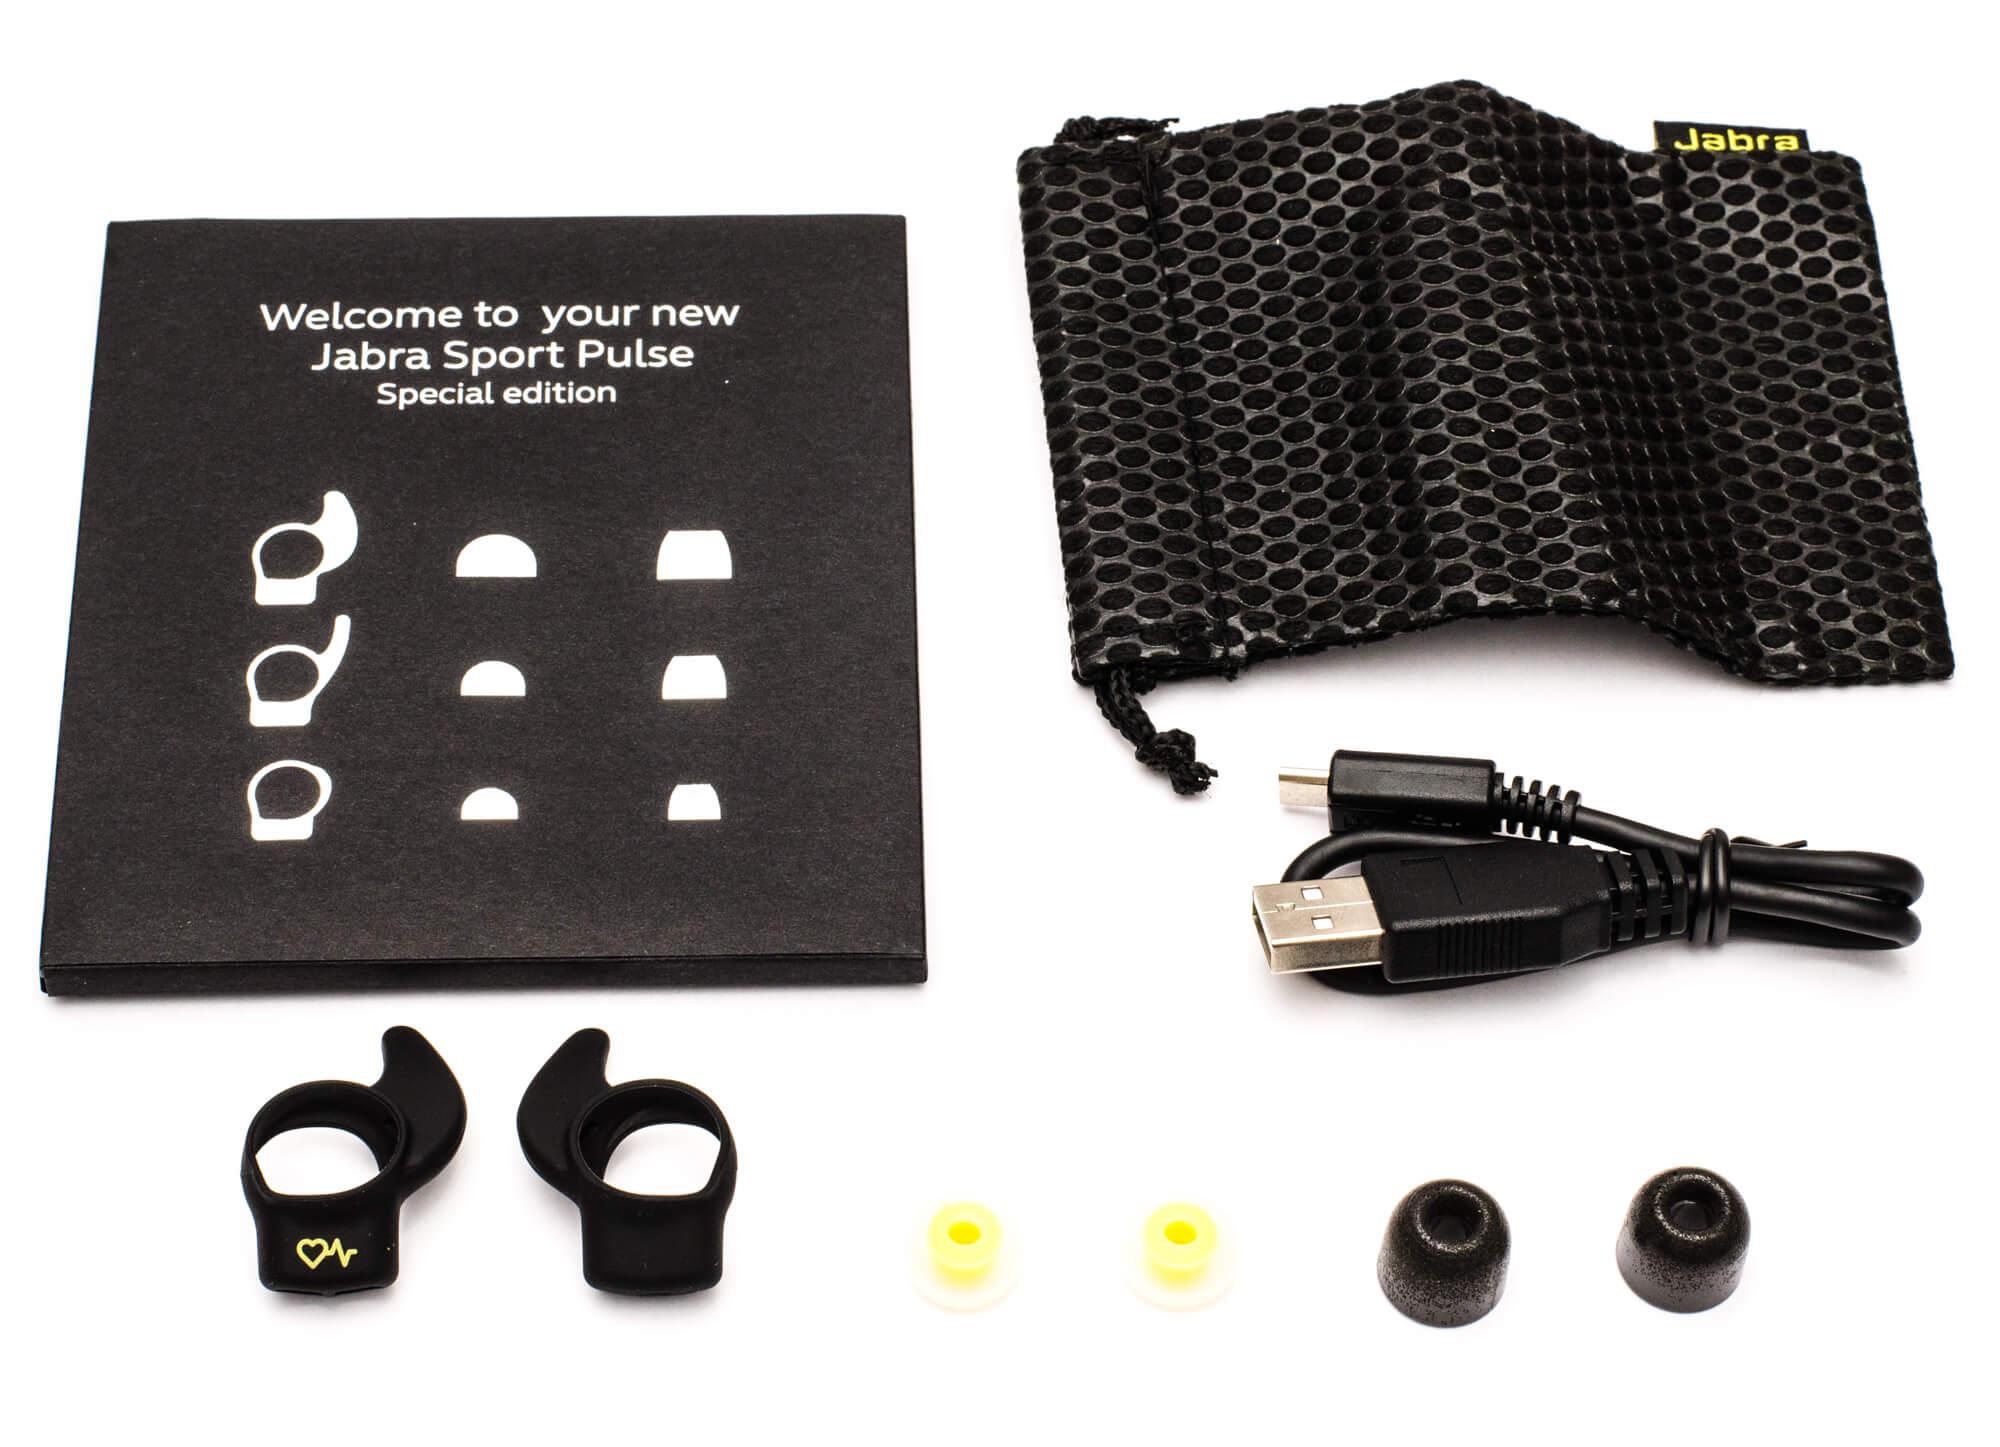 Jabra Sport Pulse - Verpackungsinhalt